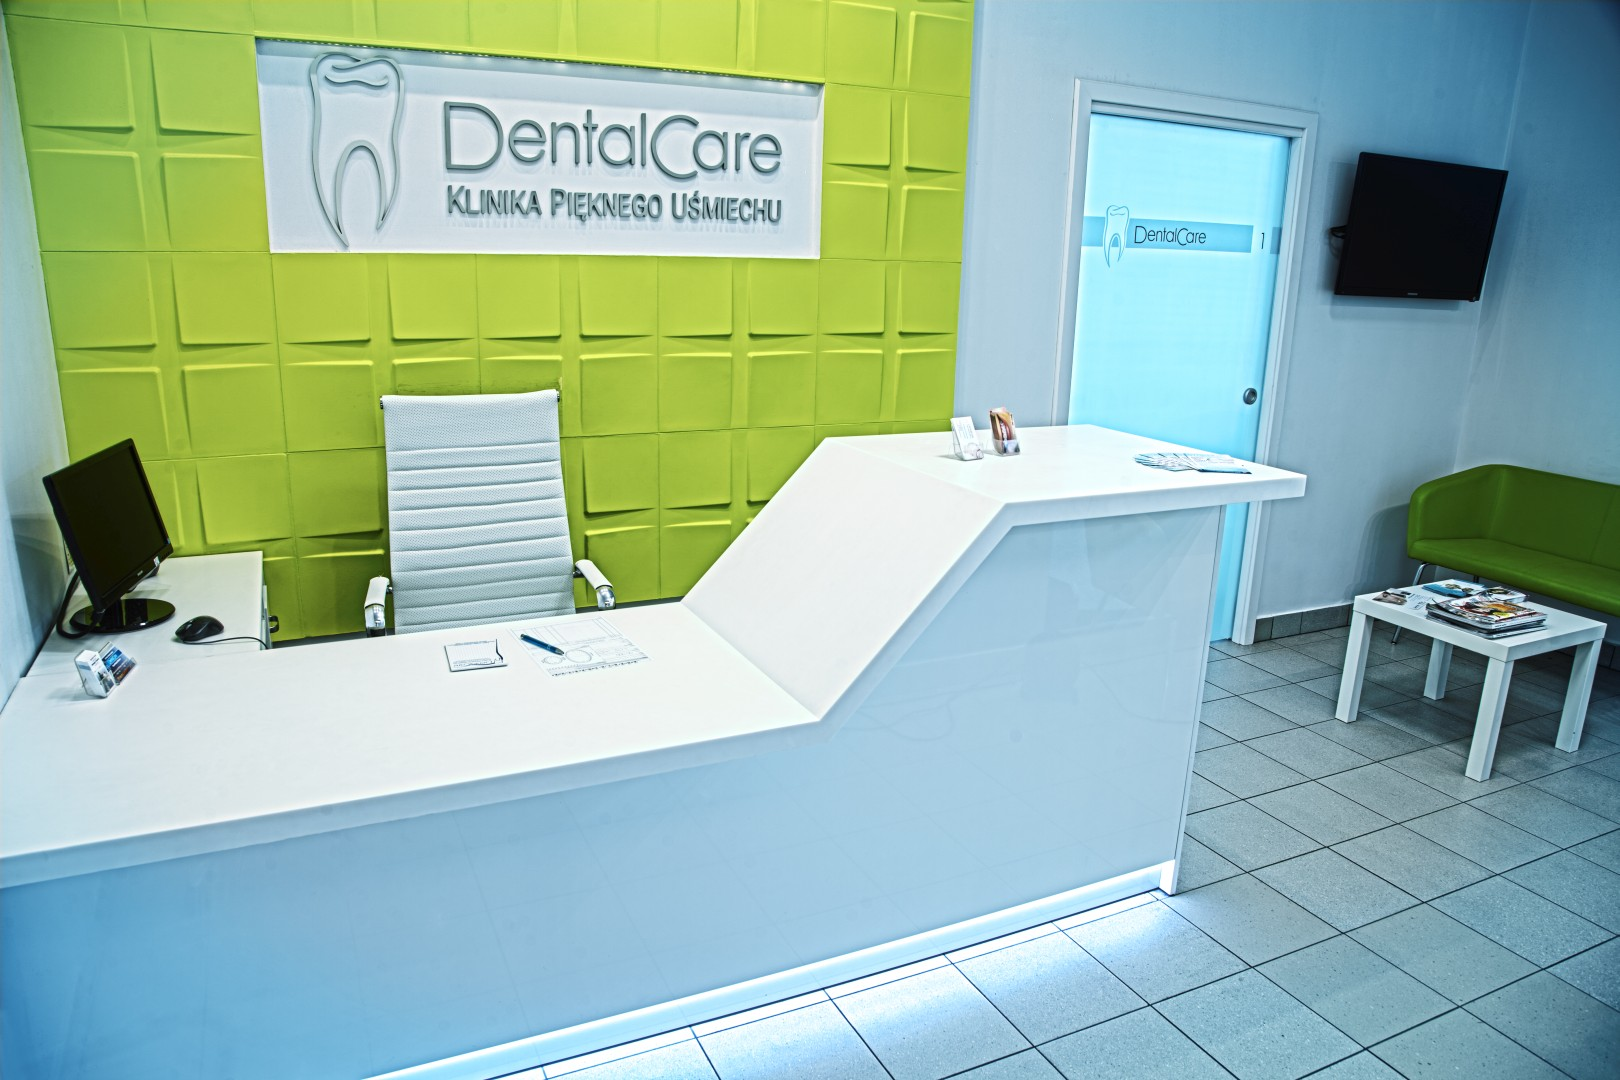 DentalCare_36.jpg